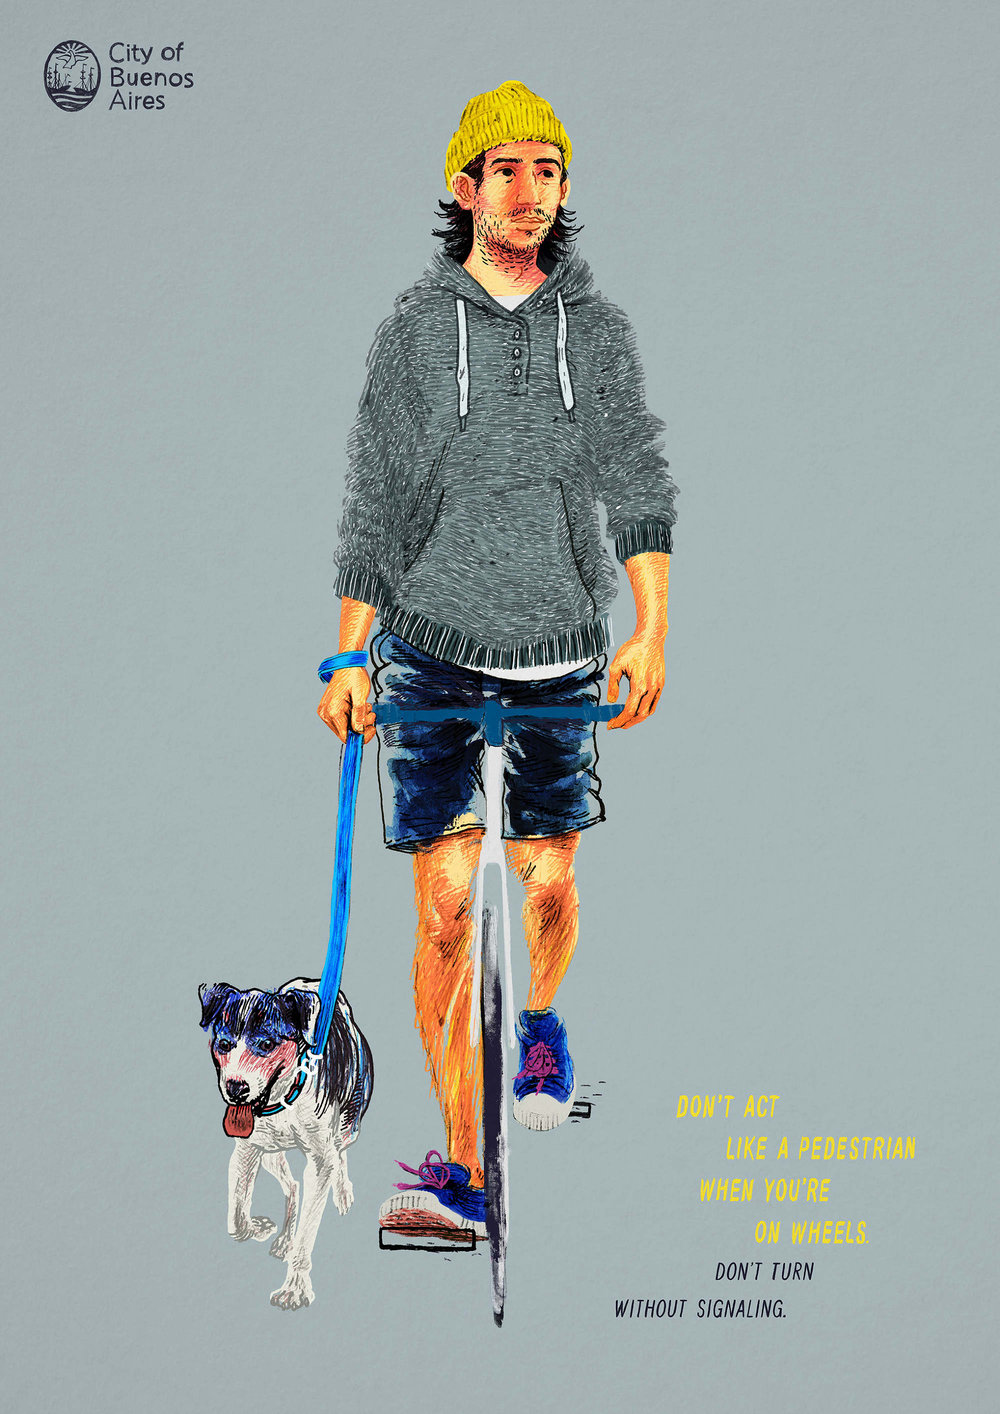 Bici-Dog_2000_c.jpg